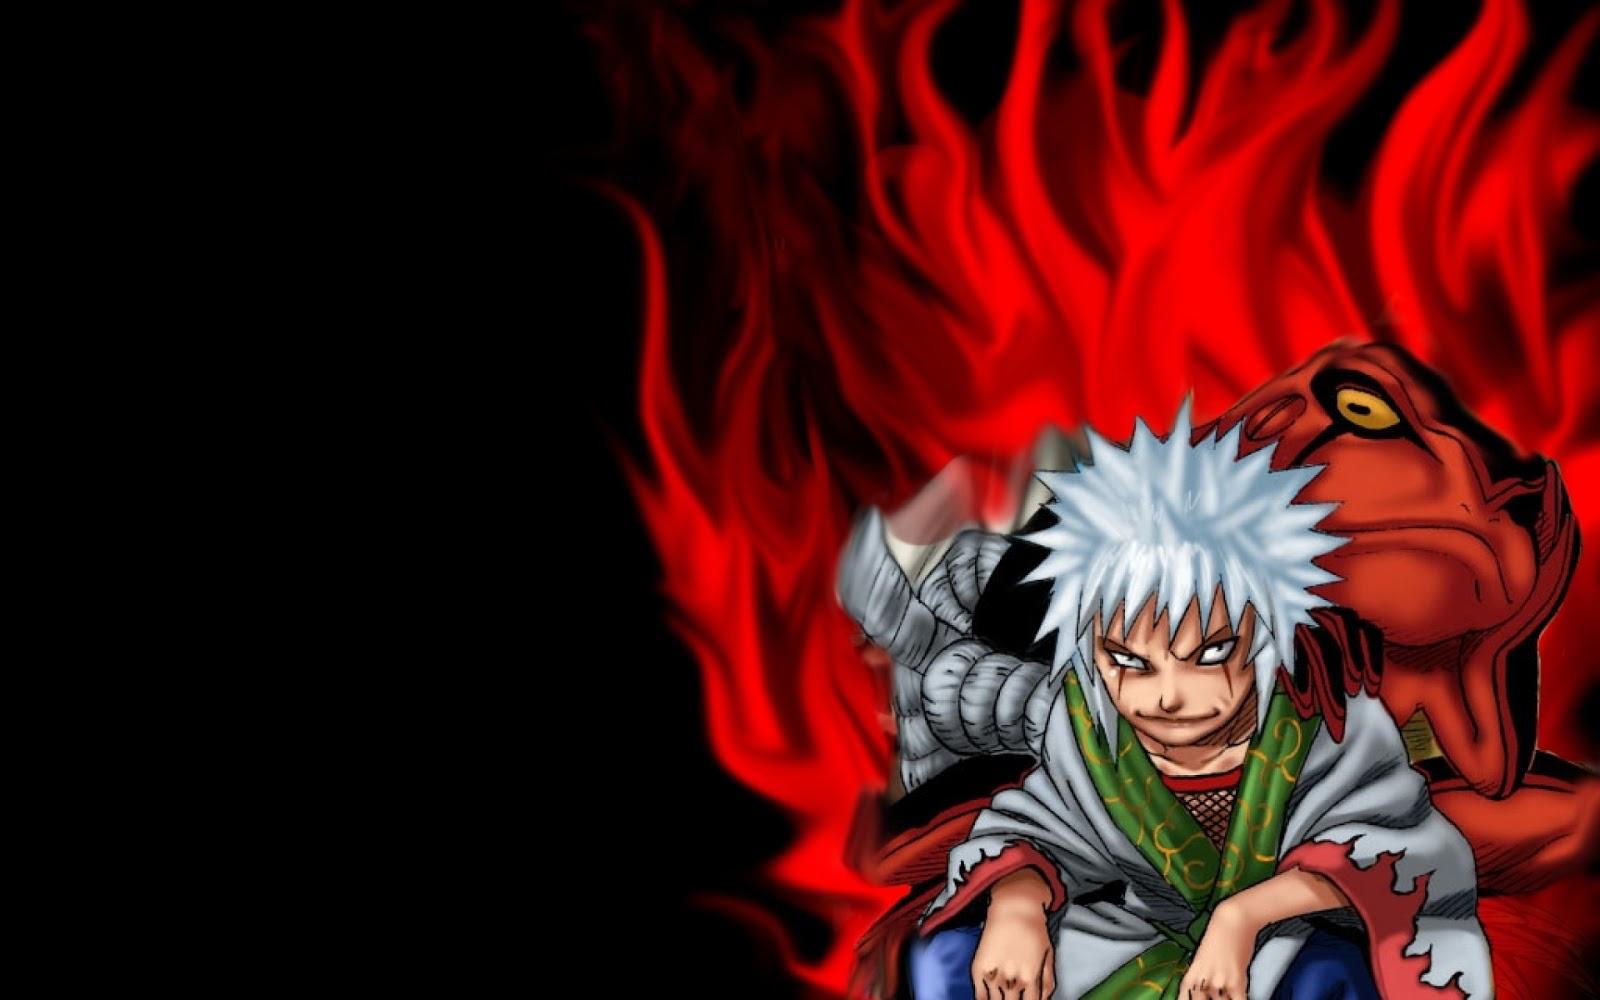 Naruto Hd Wallpapers 1080p Wallpapersafari